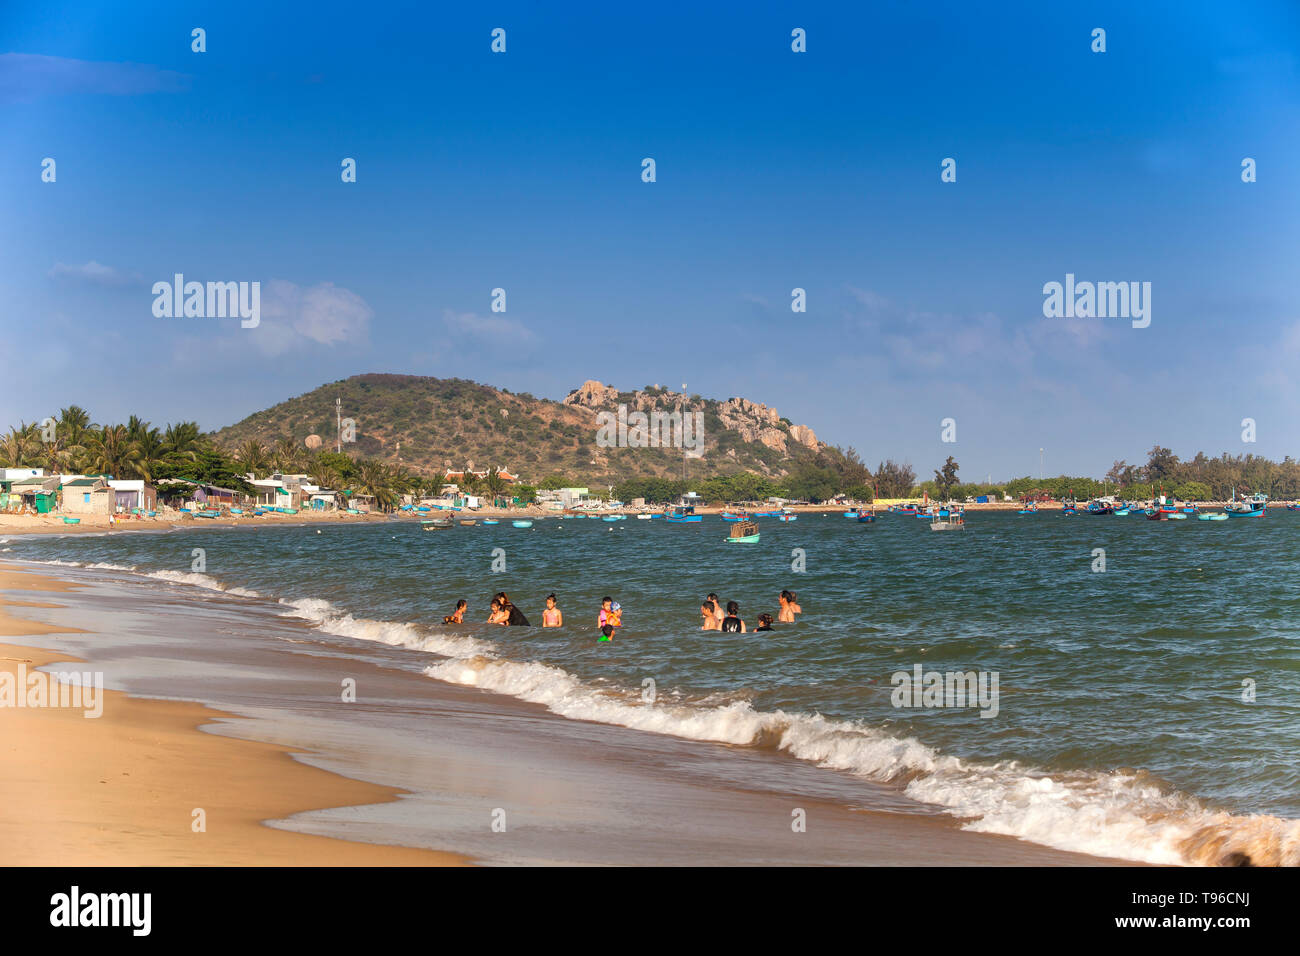 Locals people  swimming  in the sea, near Saigon Ninh Chu Resort on Phan Rang Beach,south china sea, Ninh Thuan, Vietnam - Stock Image